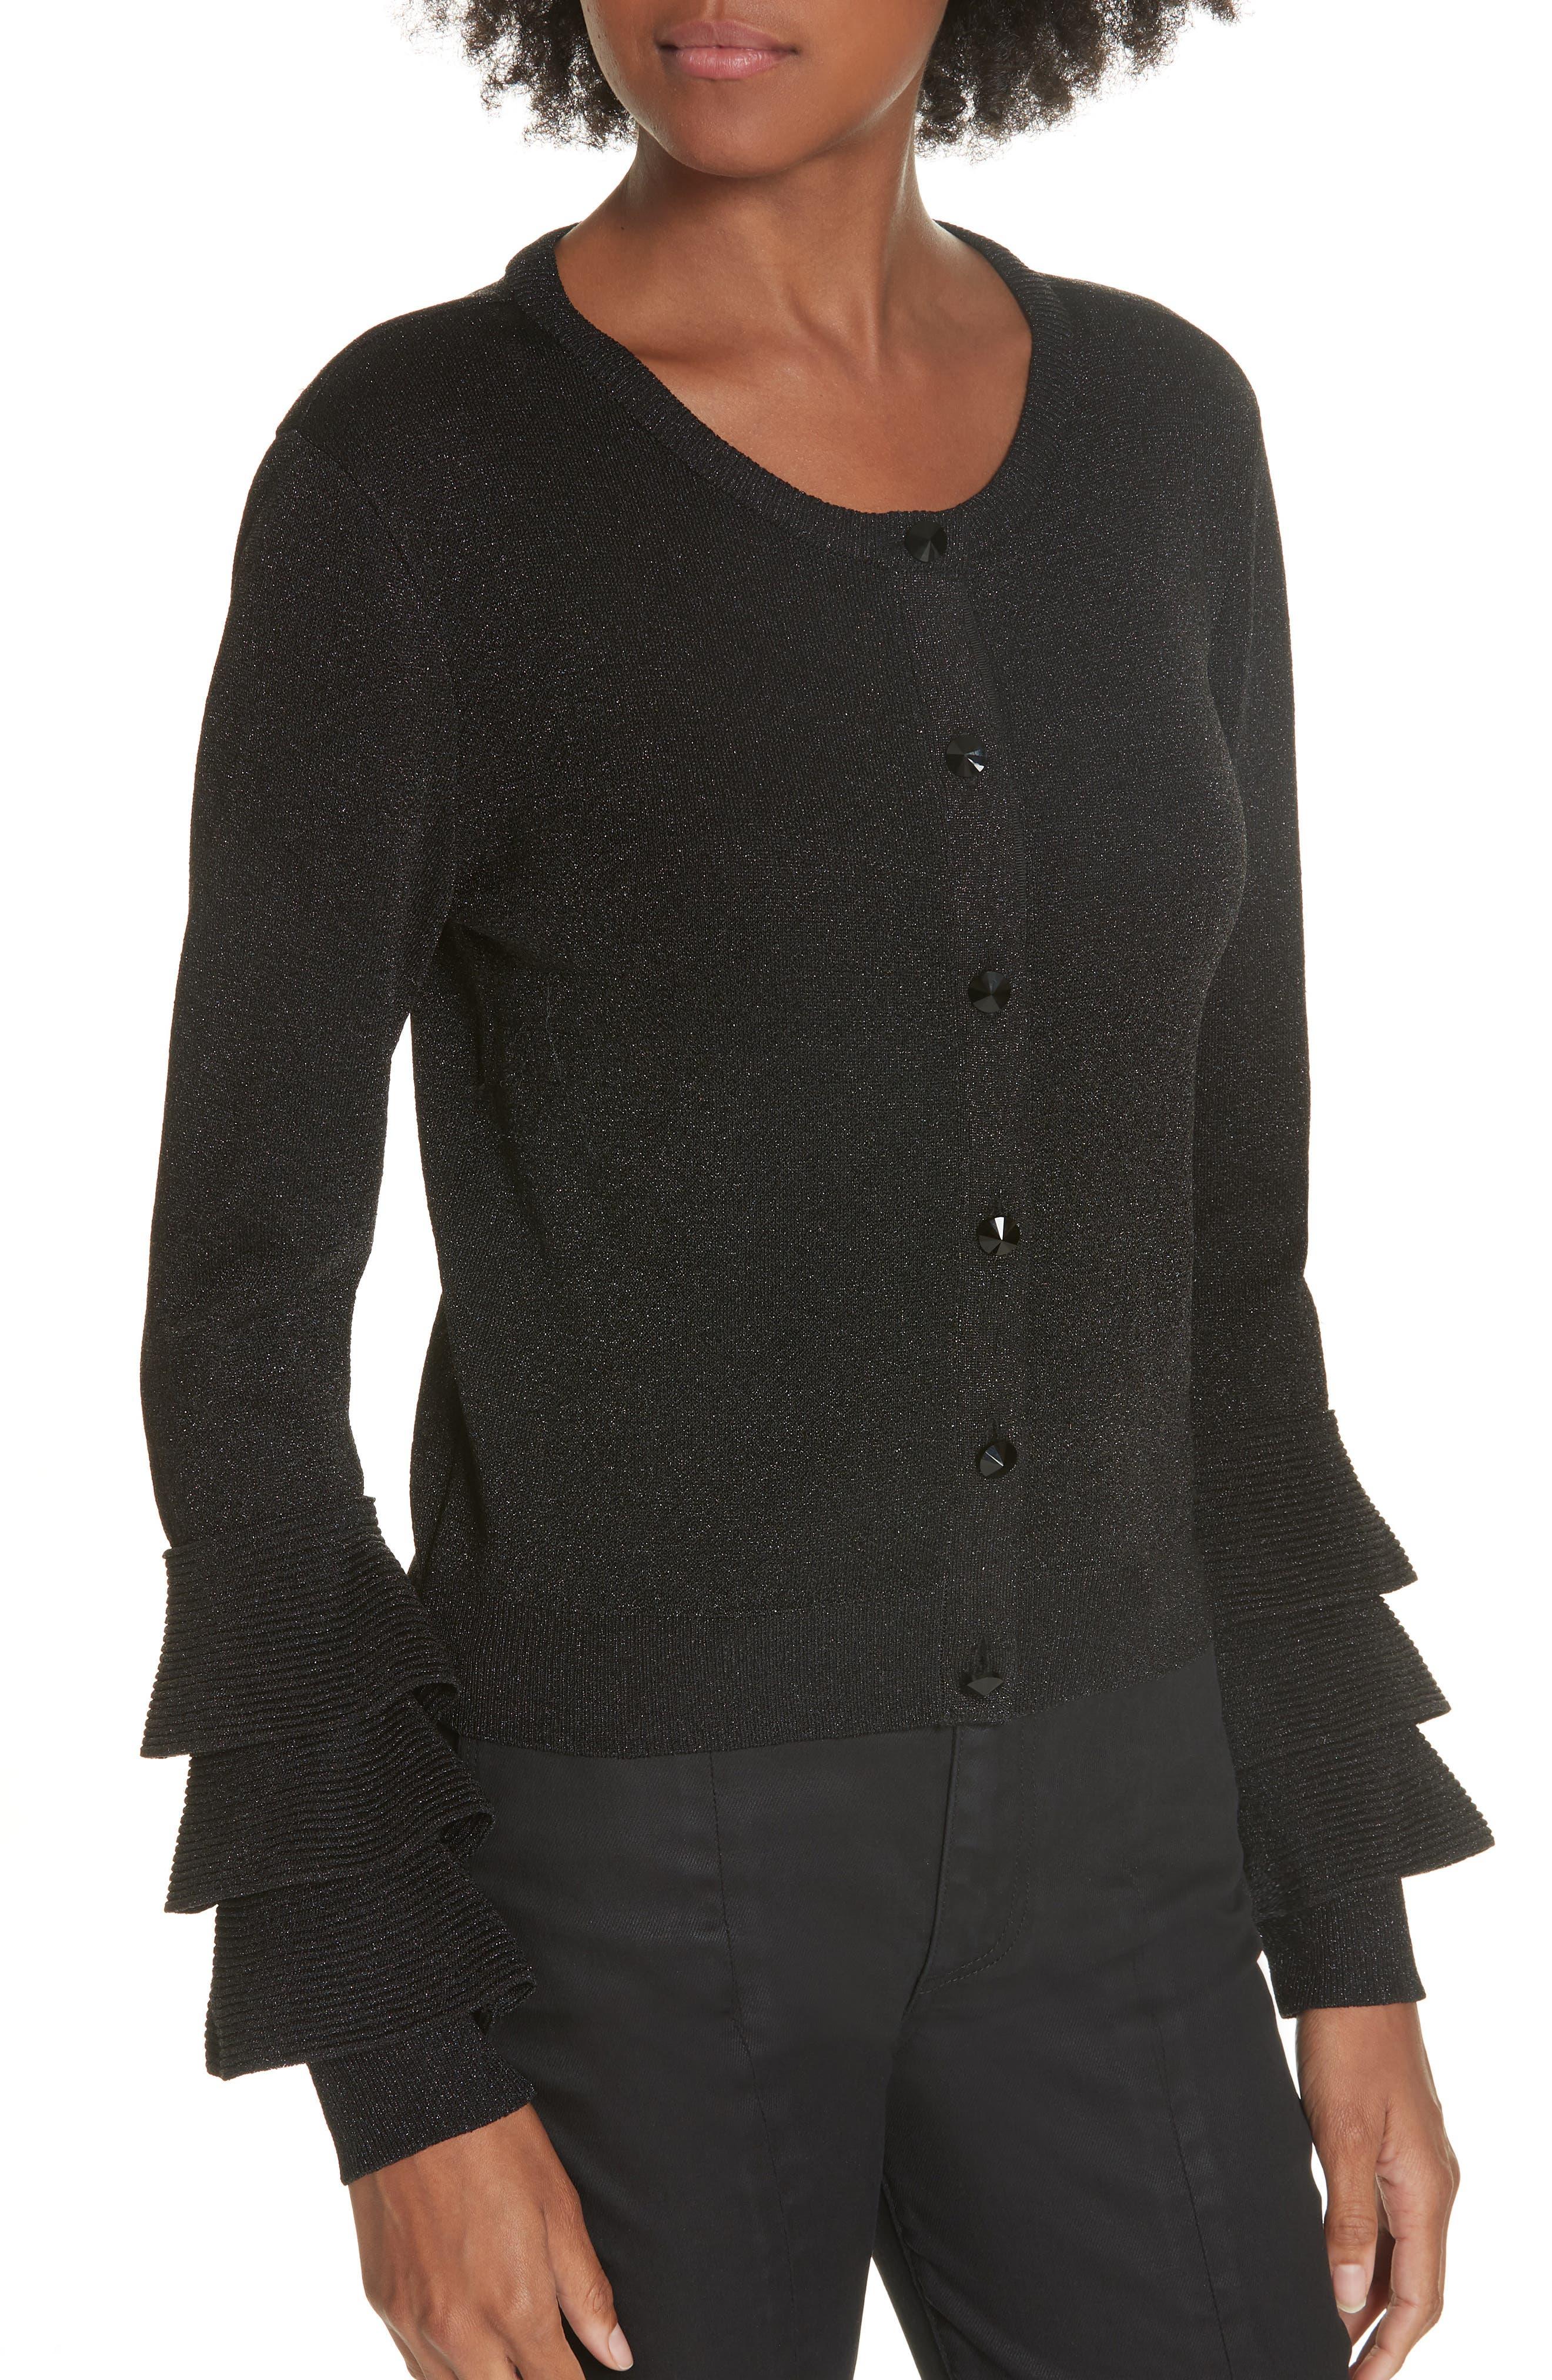 Ruthy Ruffle Cuff Sparkle Wool Blend Cardigan,                             Alternate thumbnail 4, color,                             BLACK METALLIC